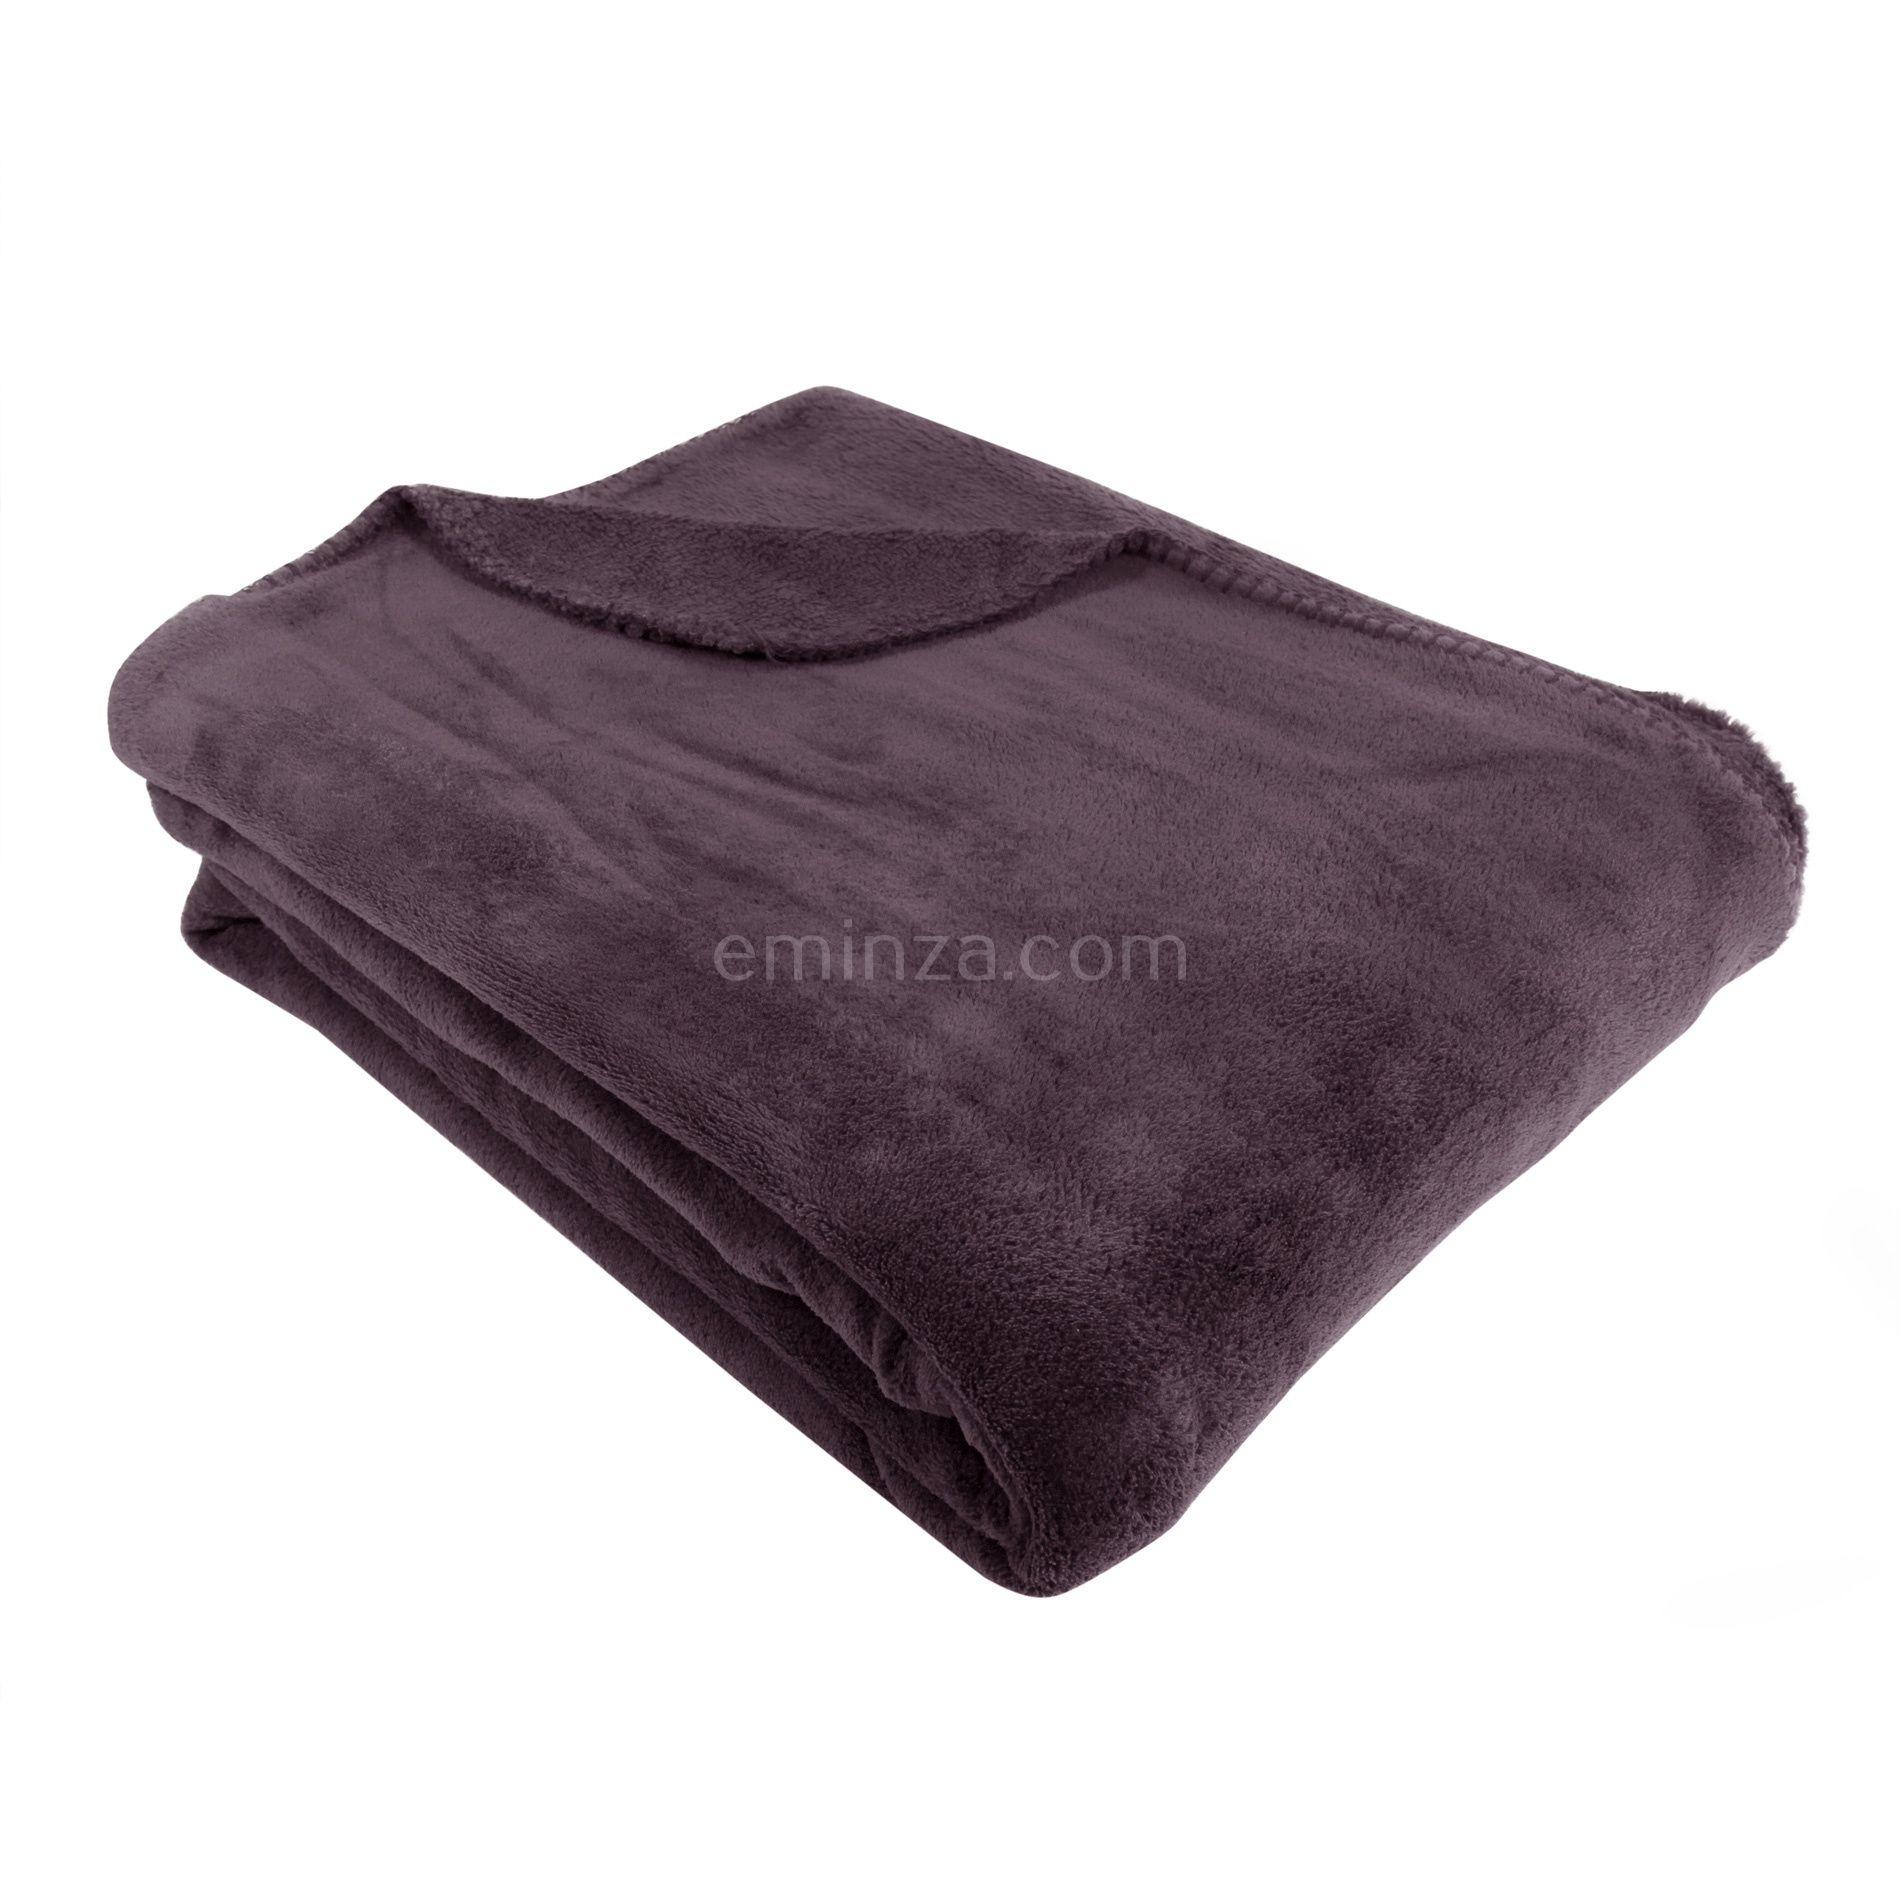 plaid polaire 230 cm tendresse aubergine plaid cocooning eminza. Black Bedroom Furniture Sets. Home Design Ideas